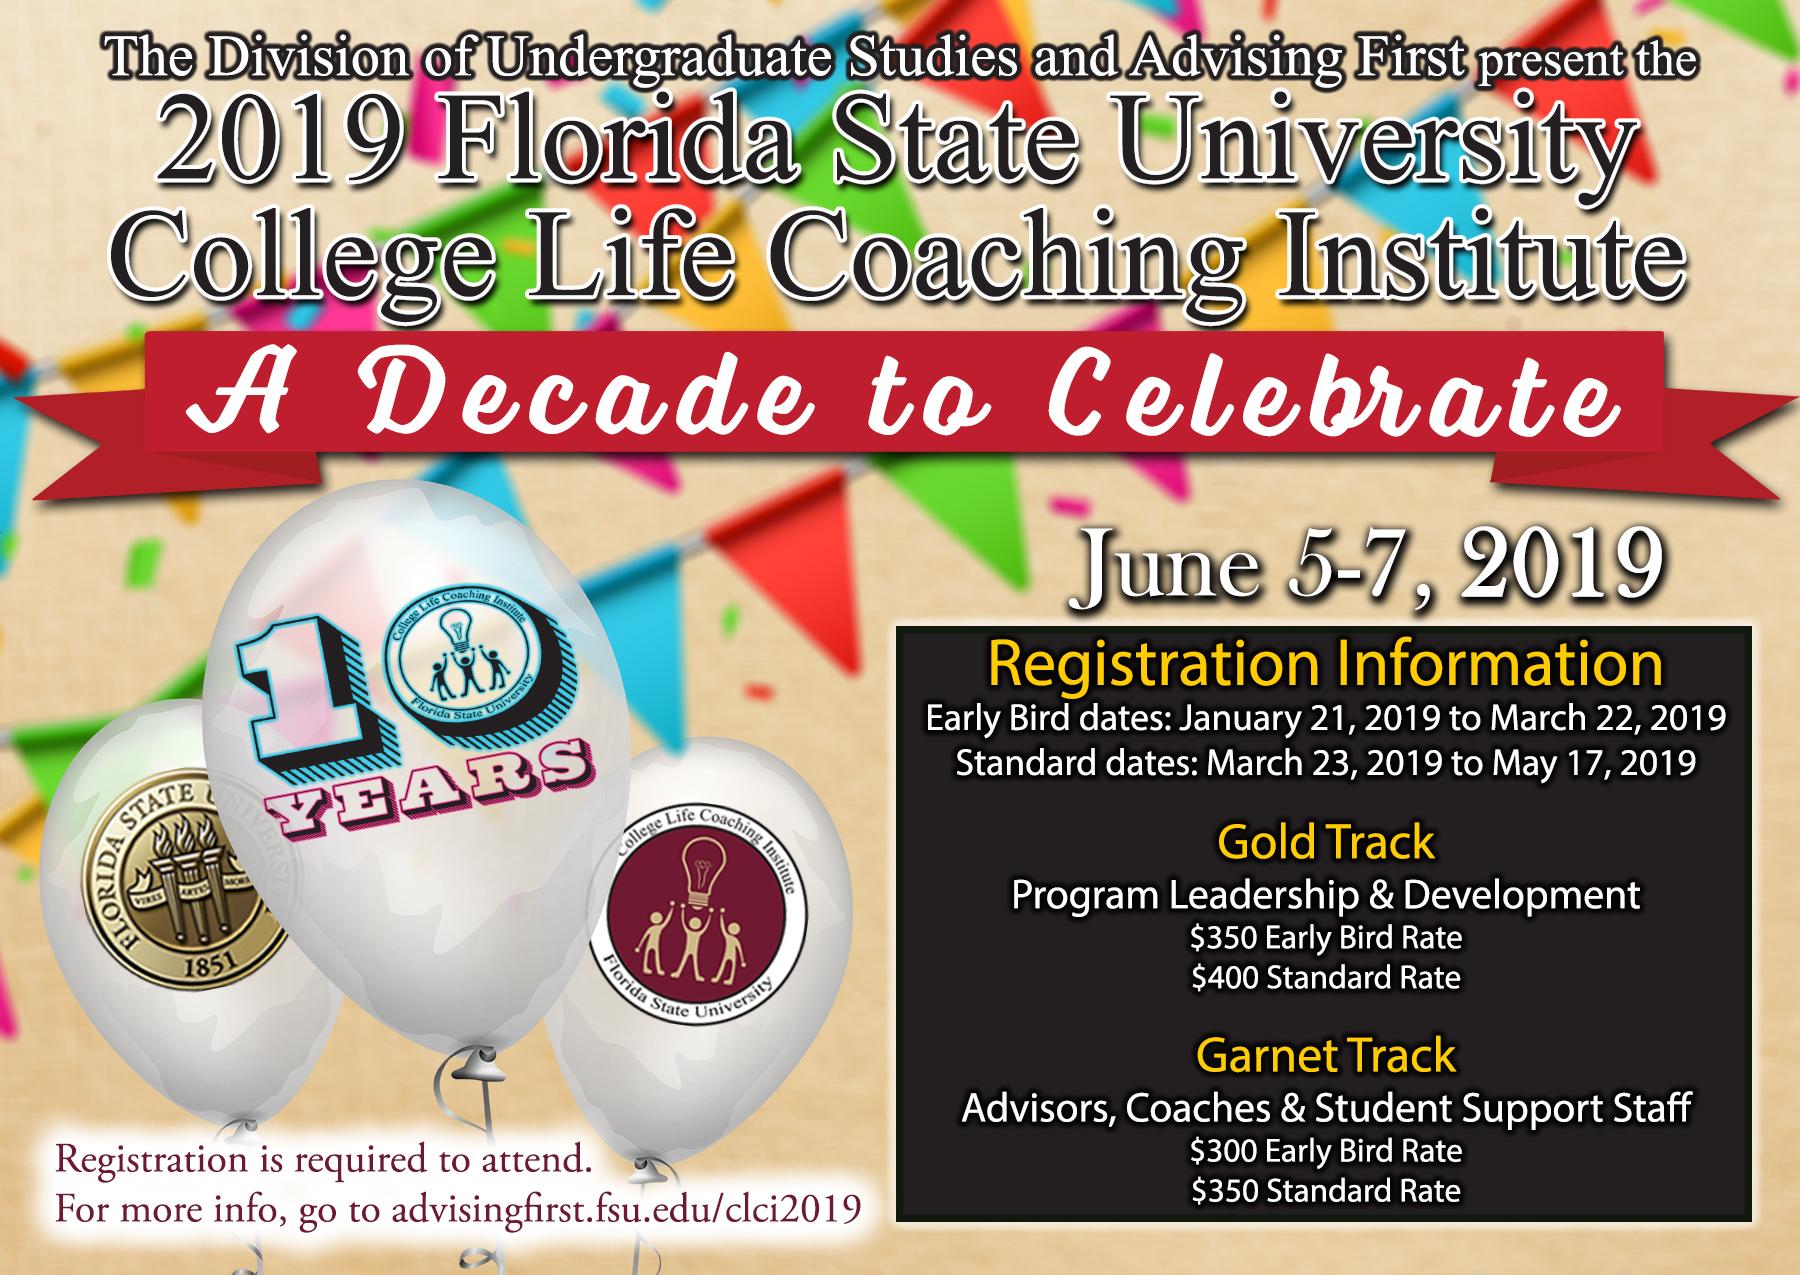 Florida State University College Life Coaching Institute 2019